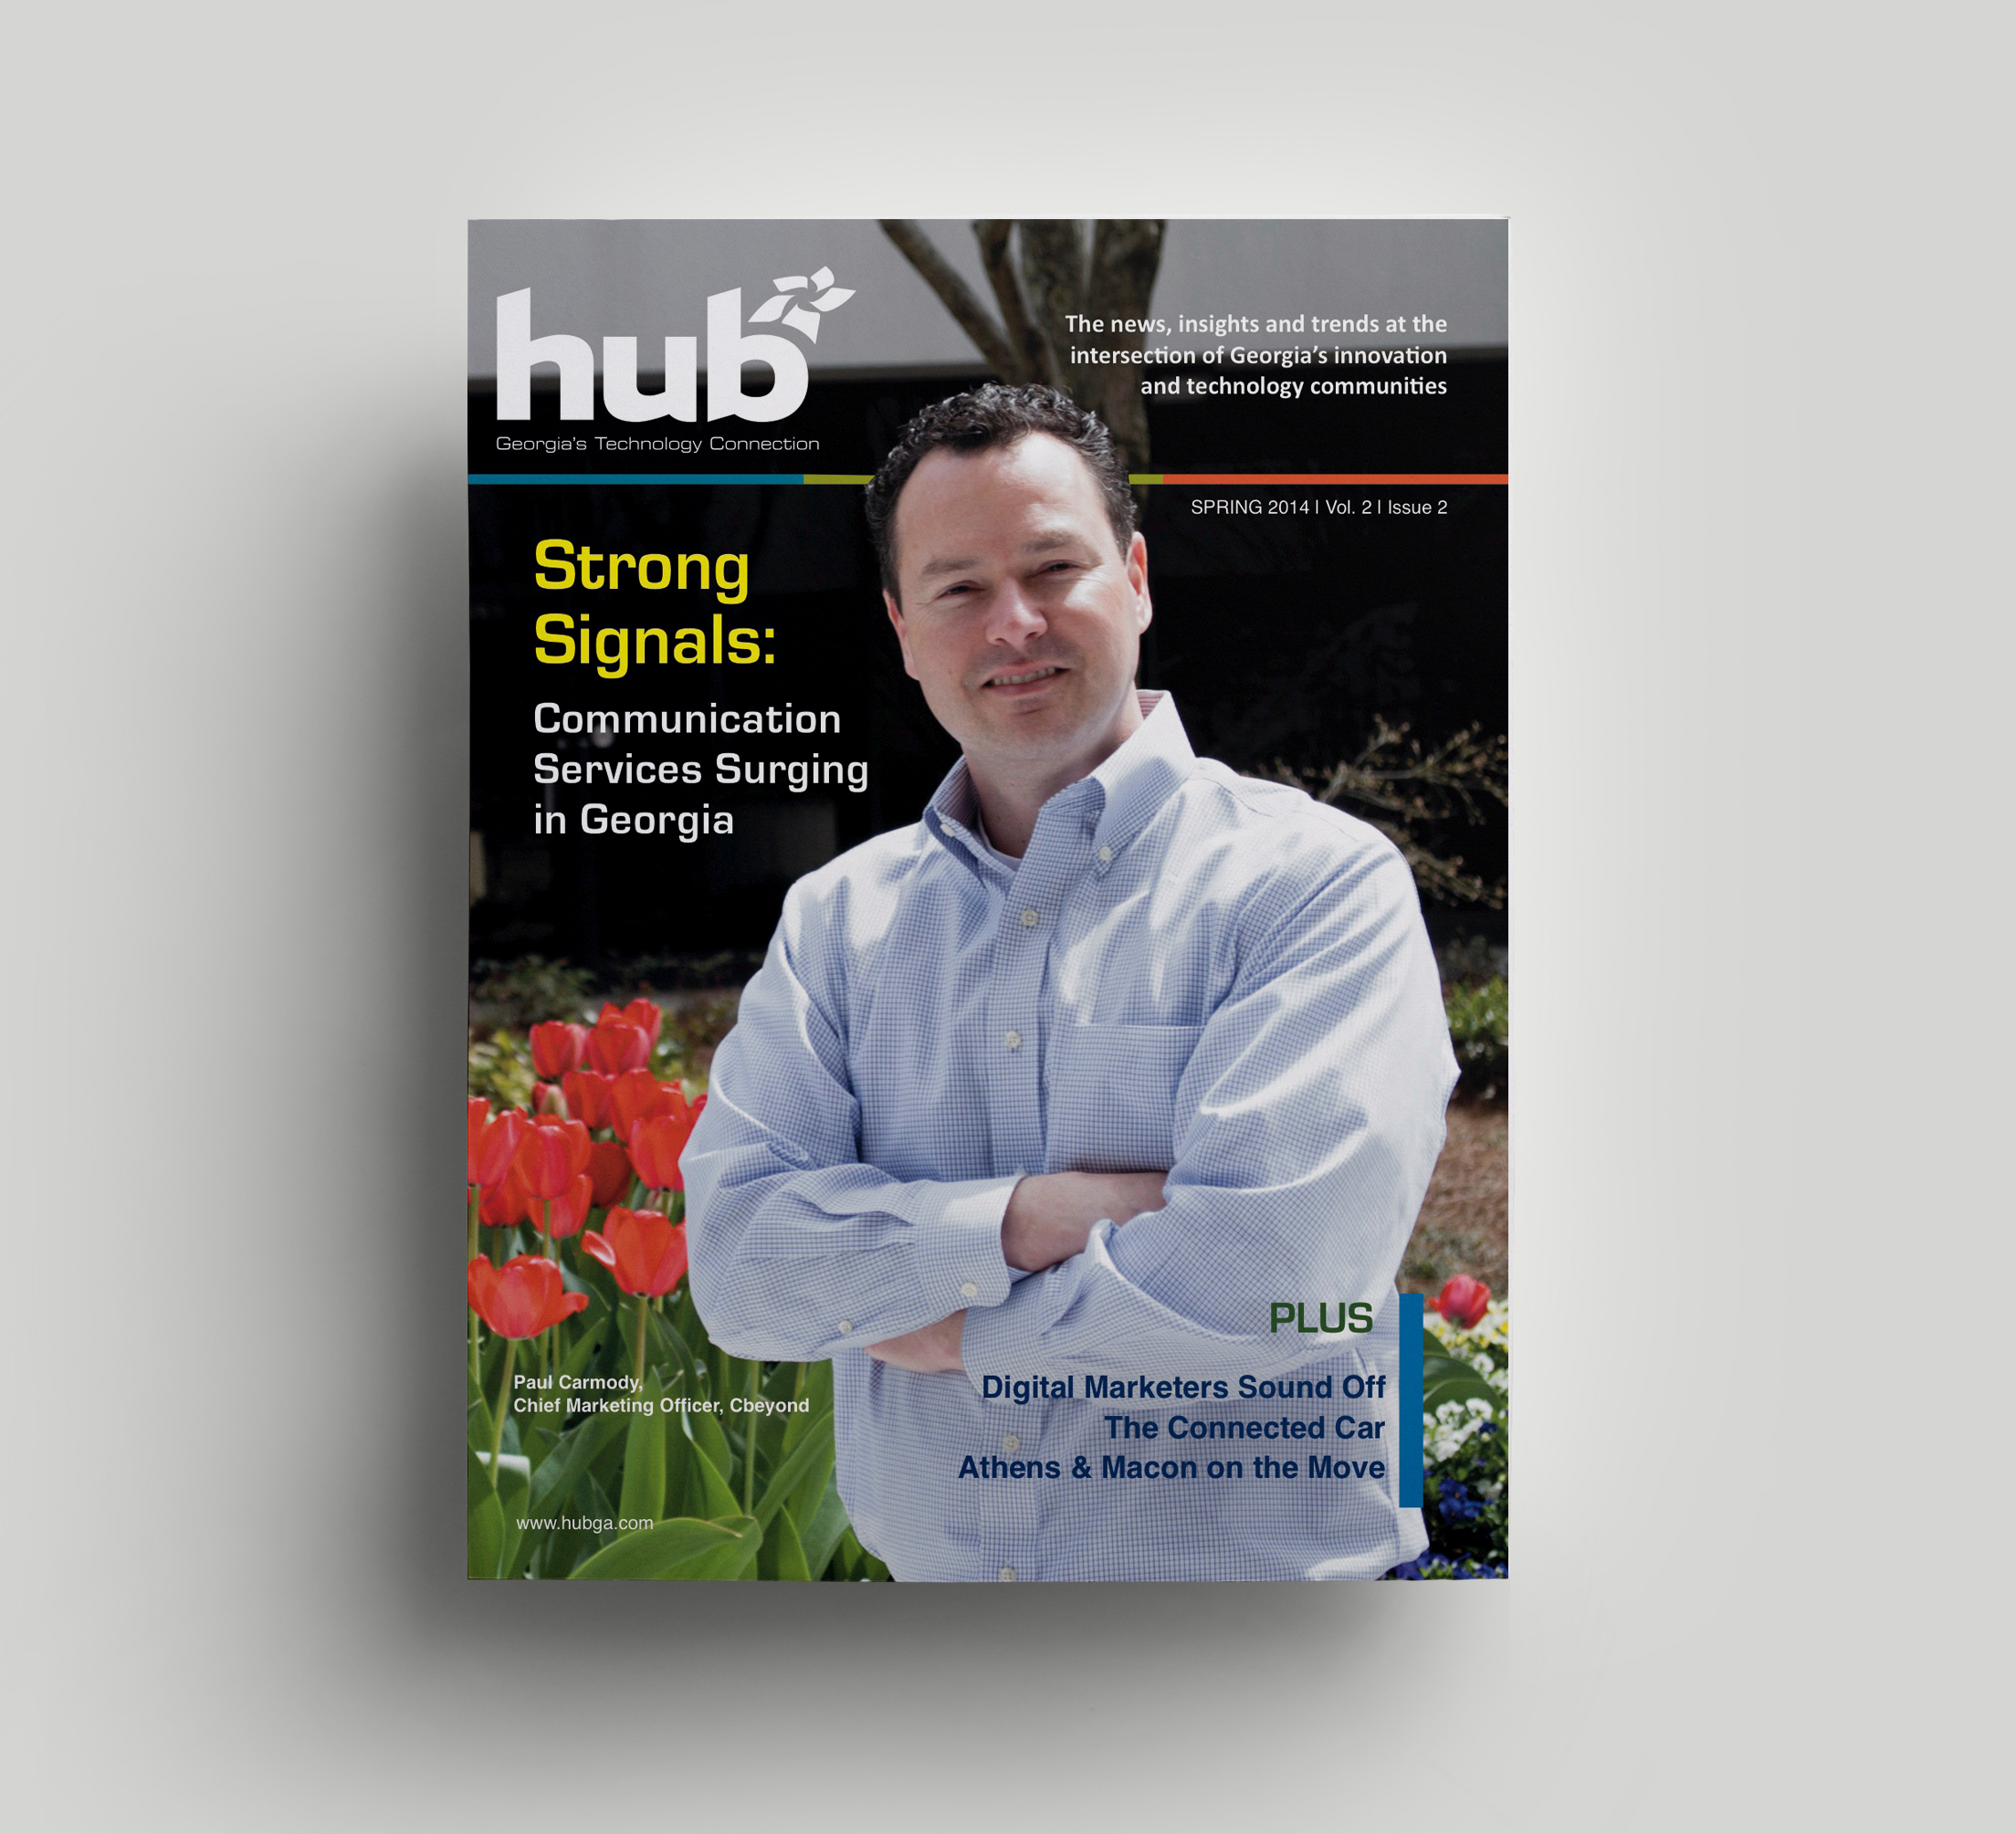 HUB Magazine Cover